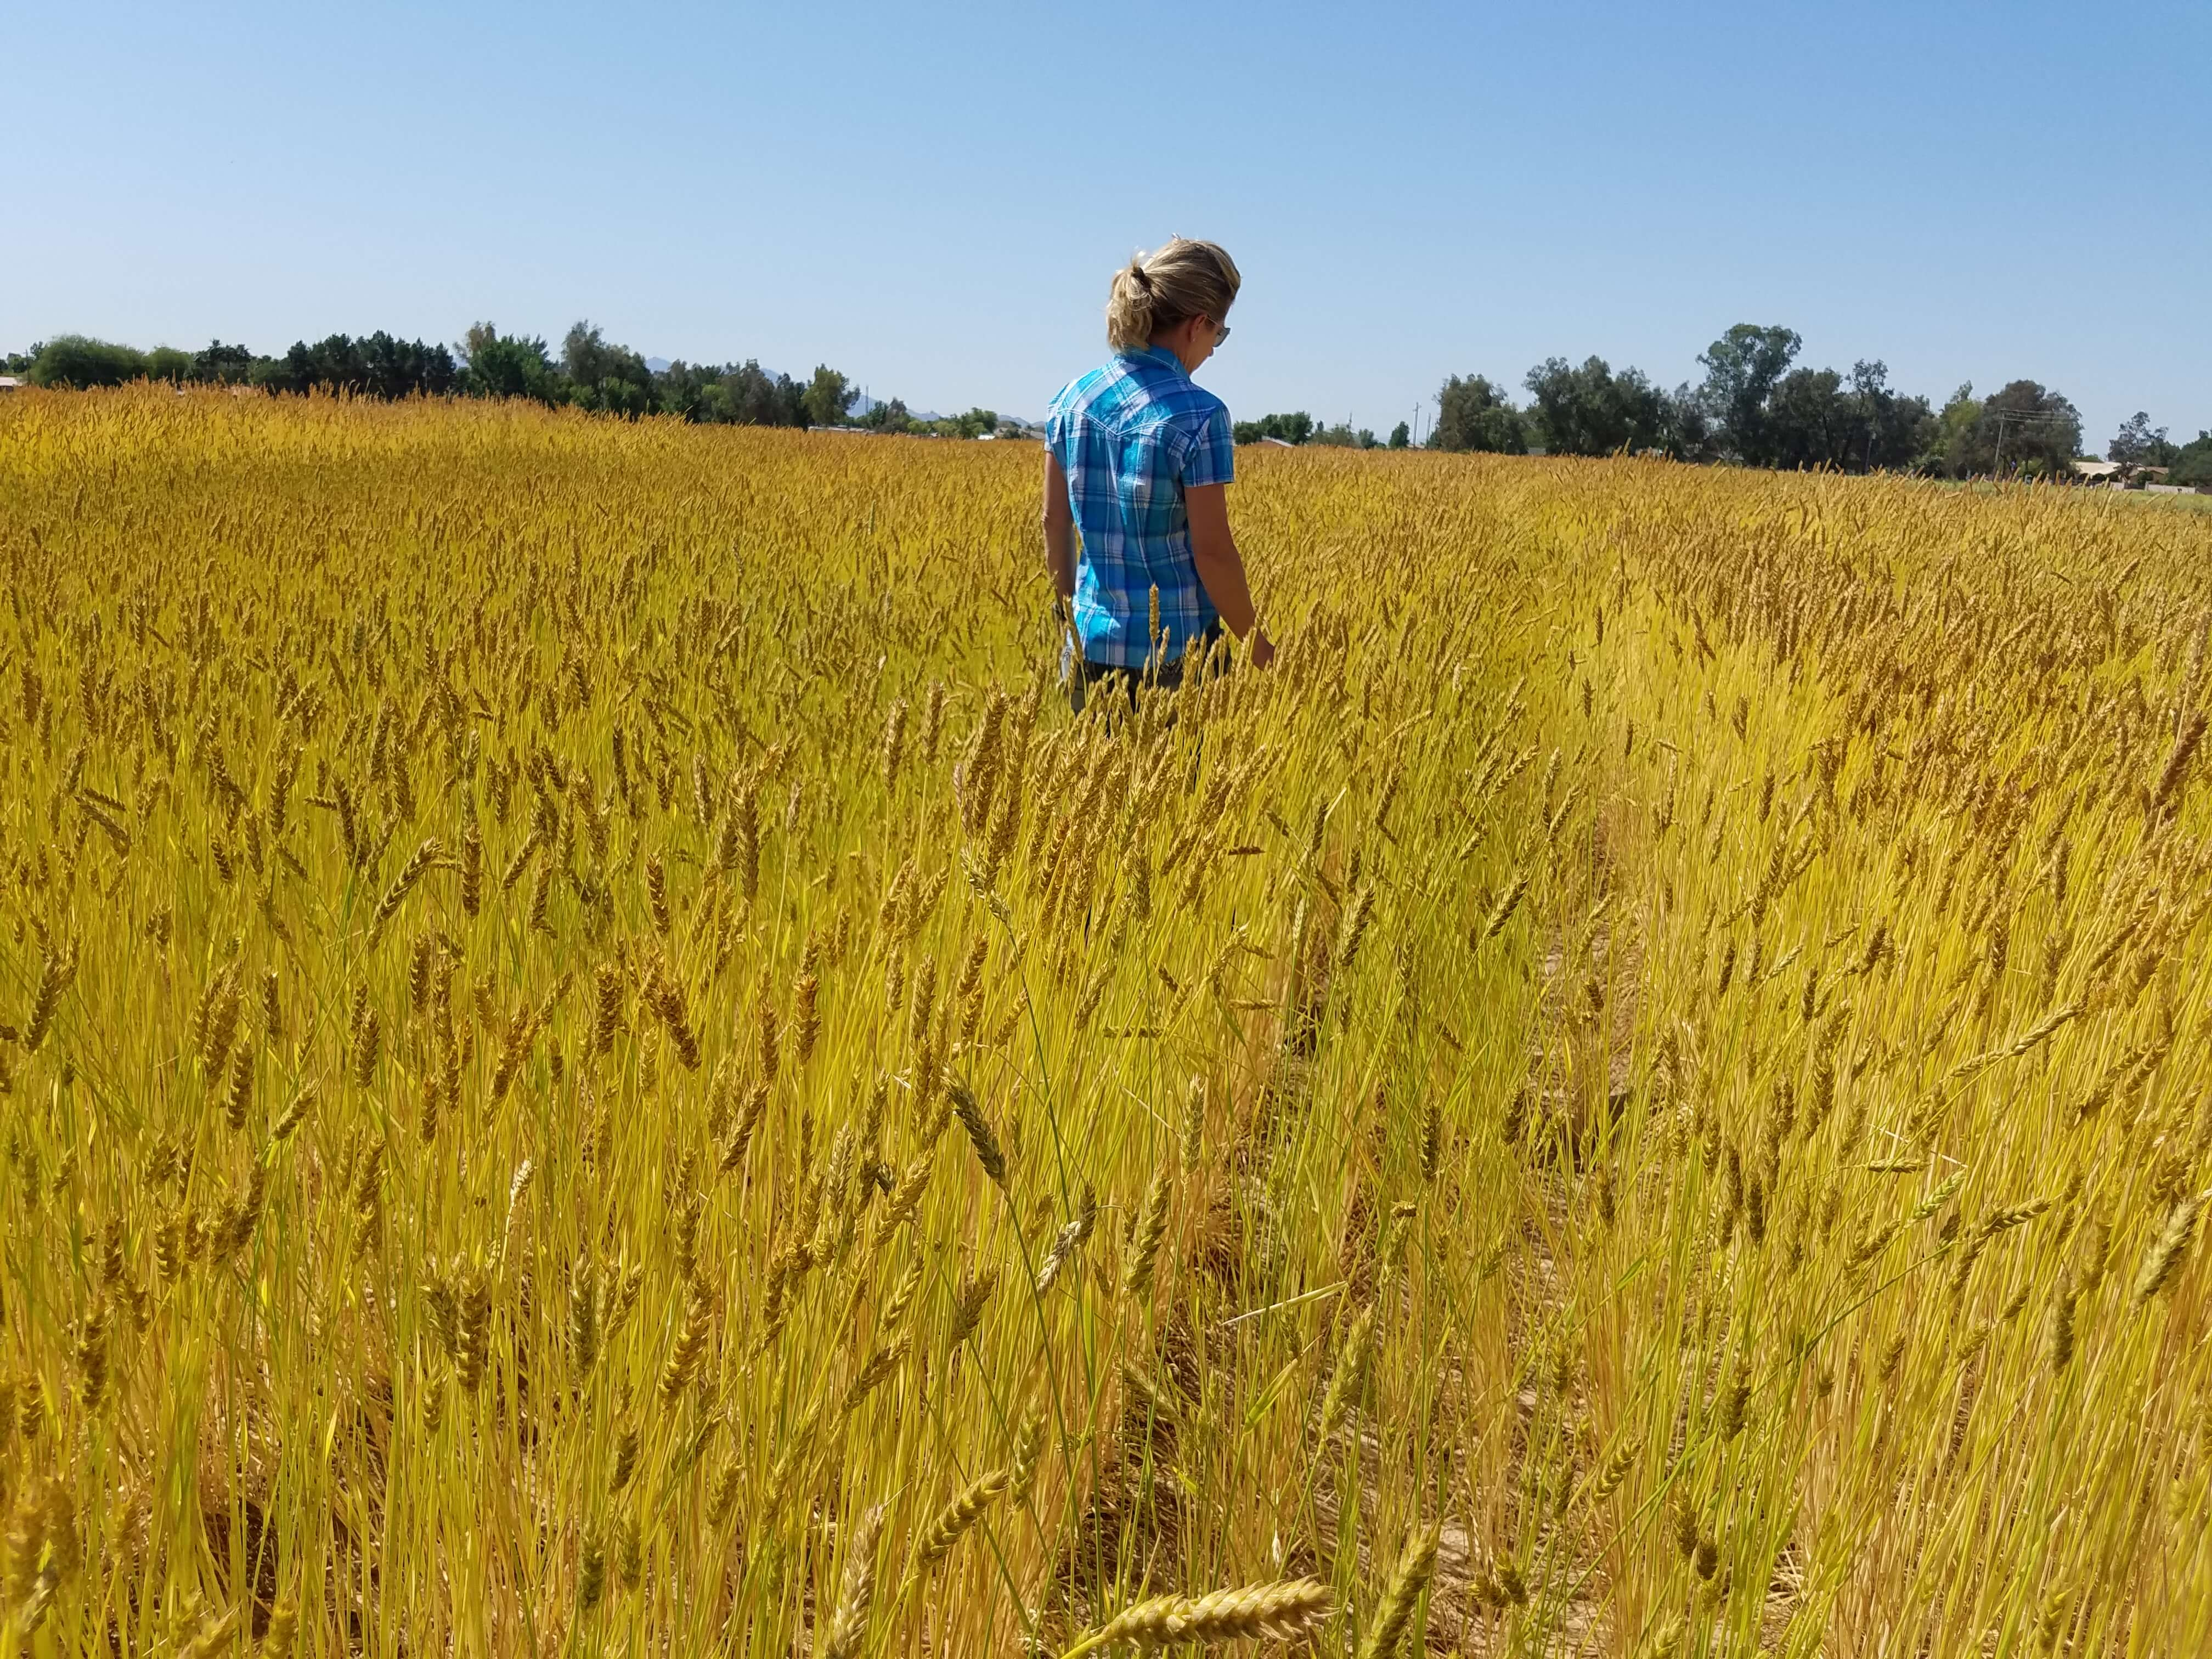 Janna in Wheat 5.1.16